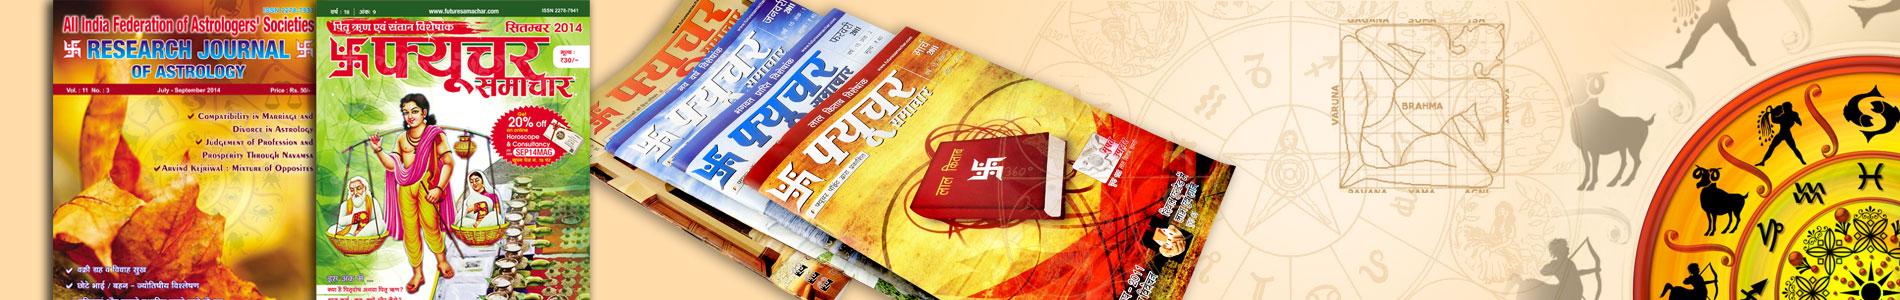 India's Most popular astrology magazine